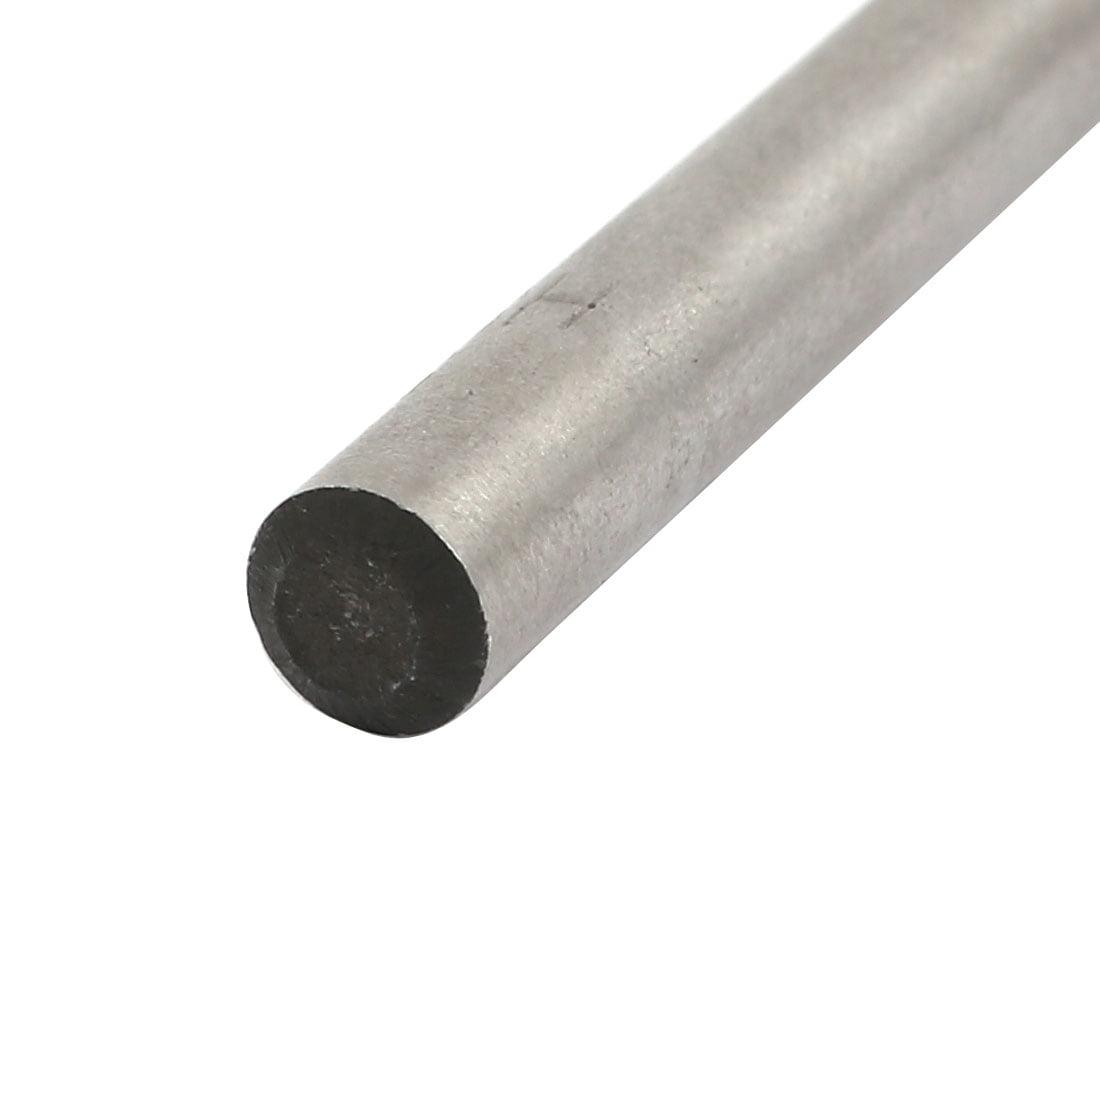 5mm Diameter 82mm Length HSS 9341 Round Shank Twist Drill Bit Drilling Tool 2pcs - image 2 of 3